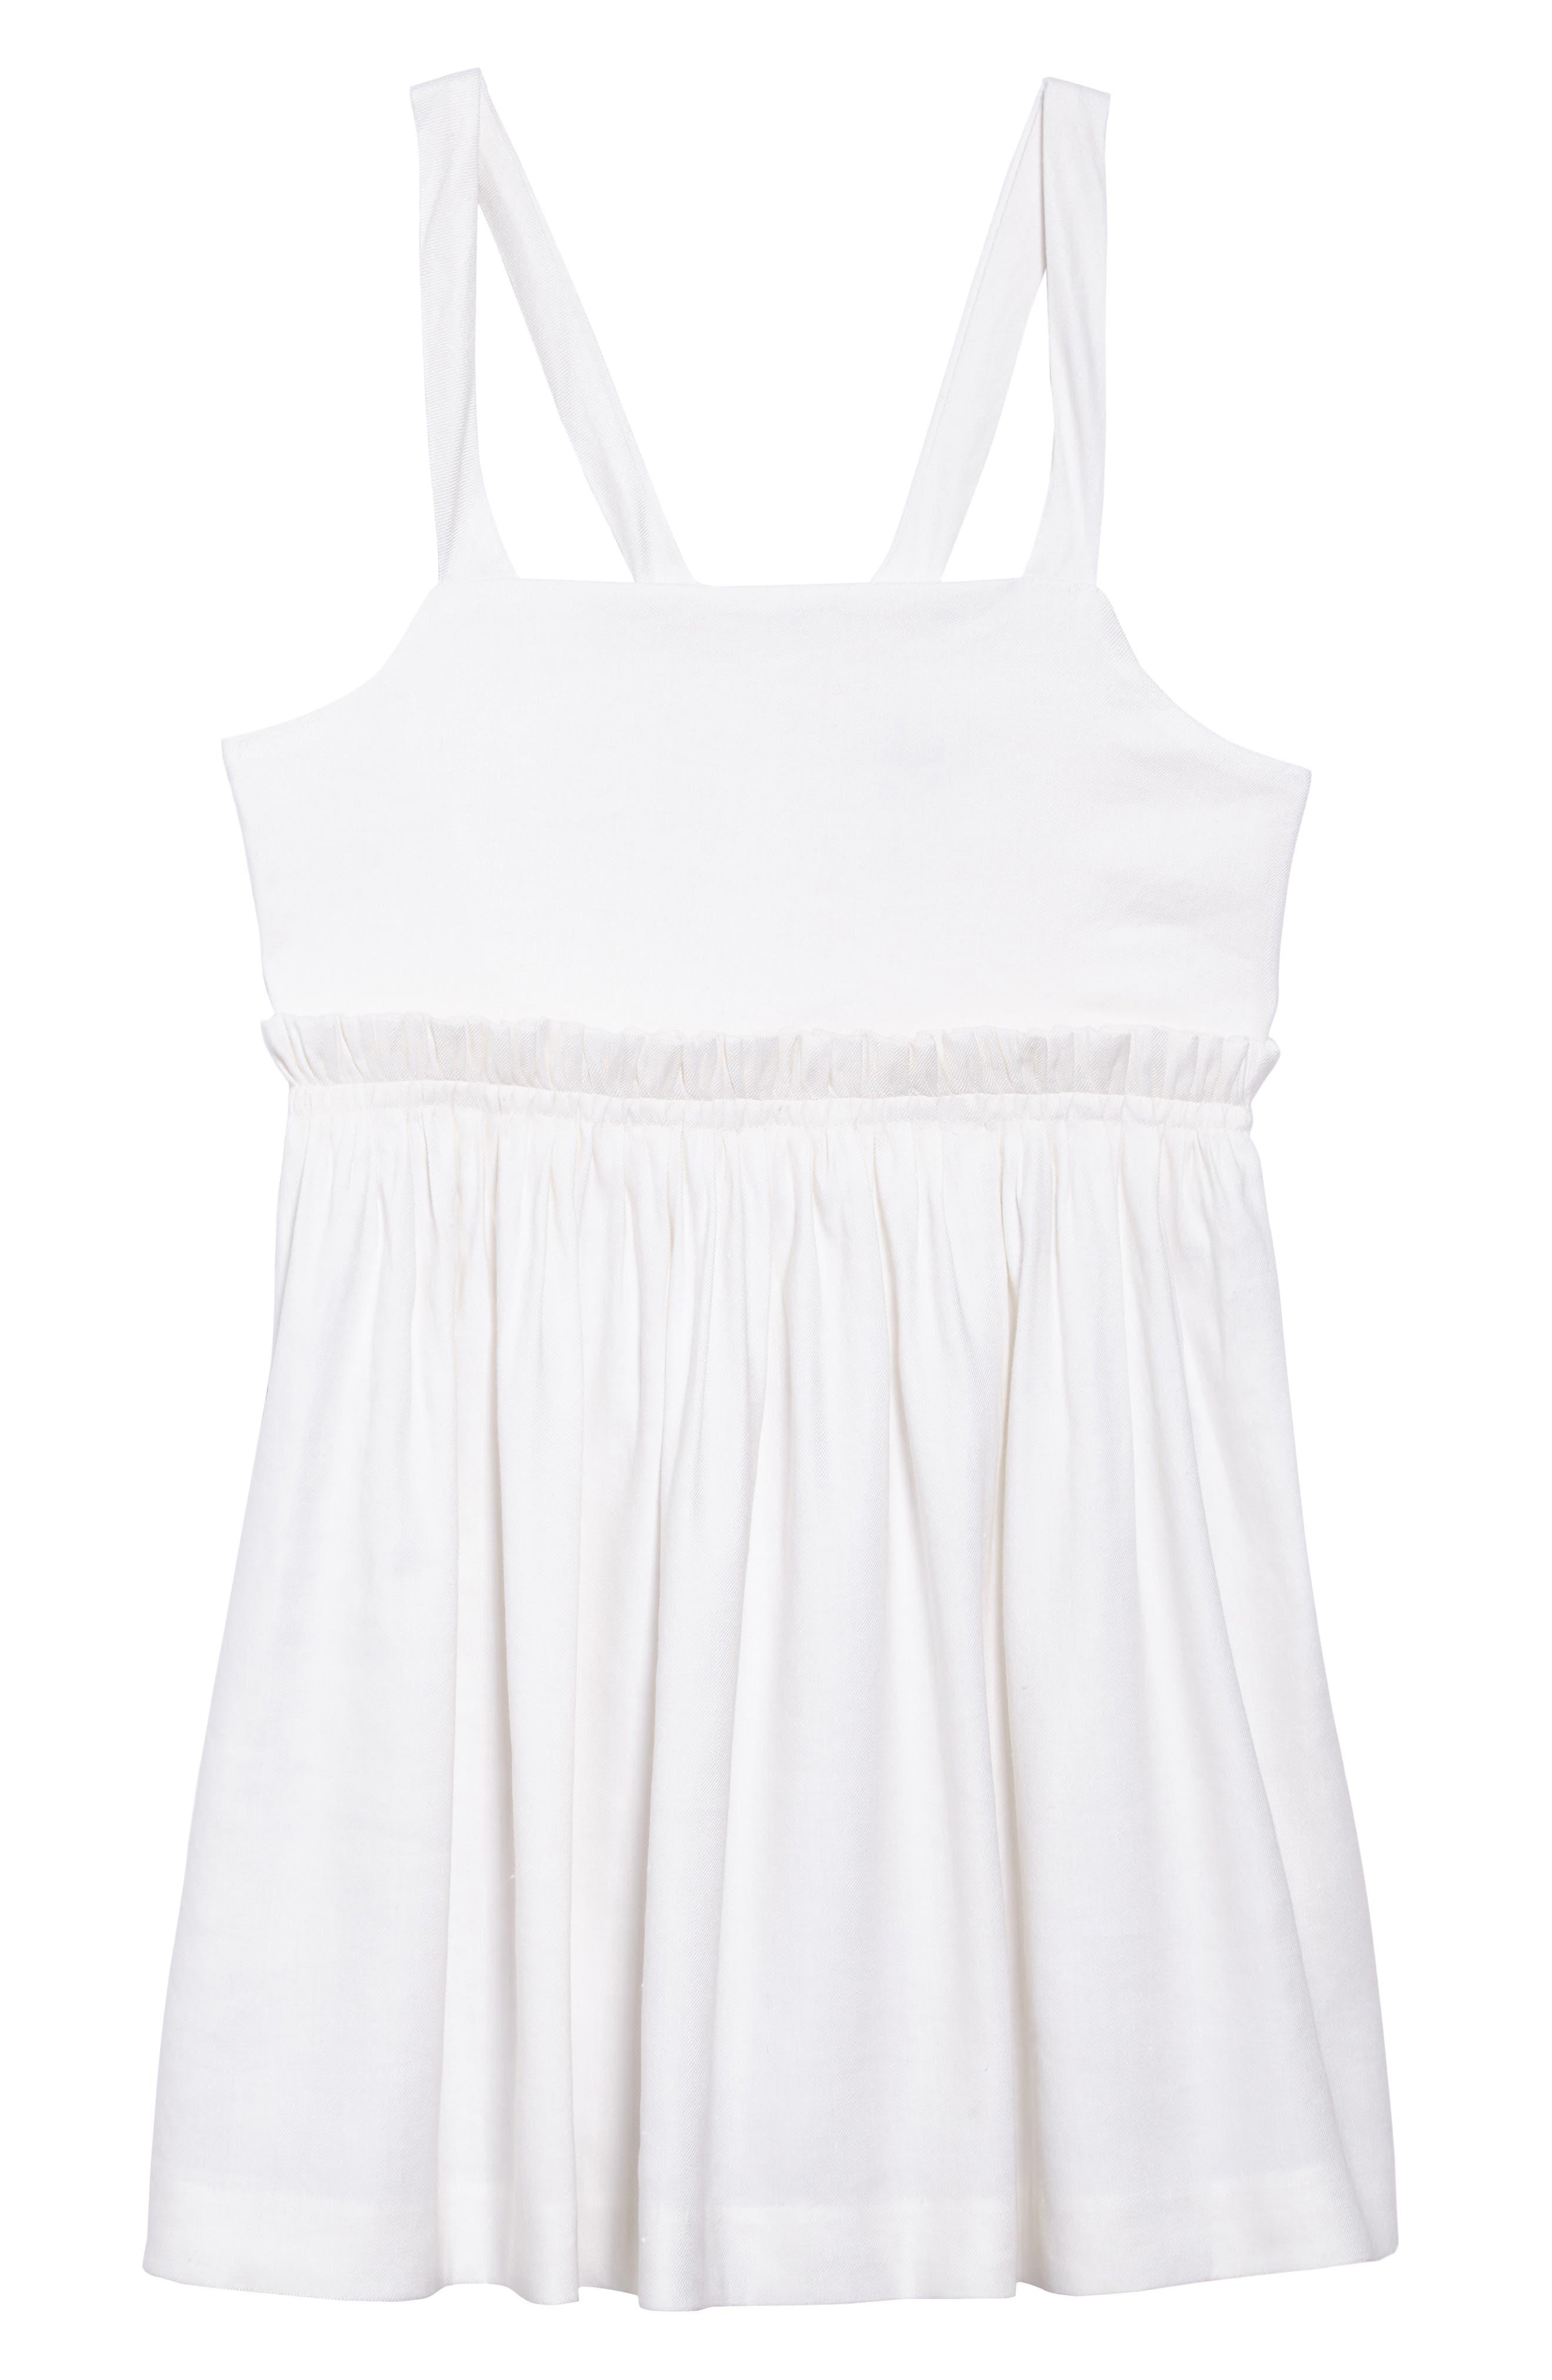 Jenny Linen Blend Dress,                         Main,                         color, 100